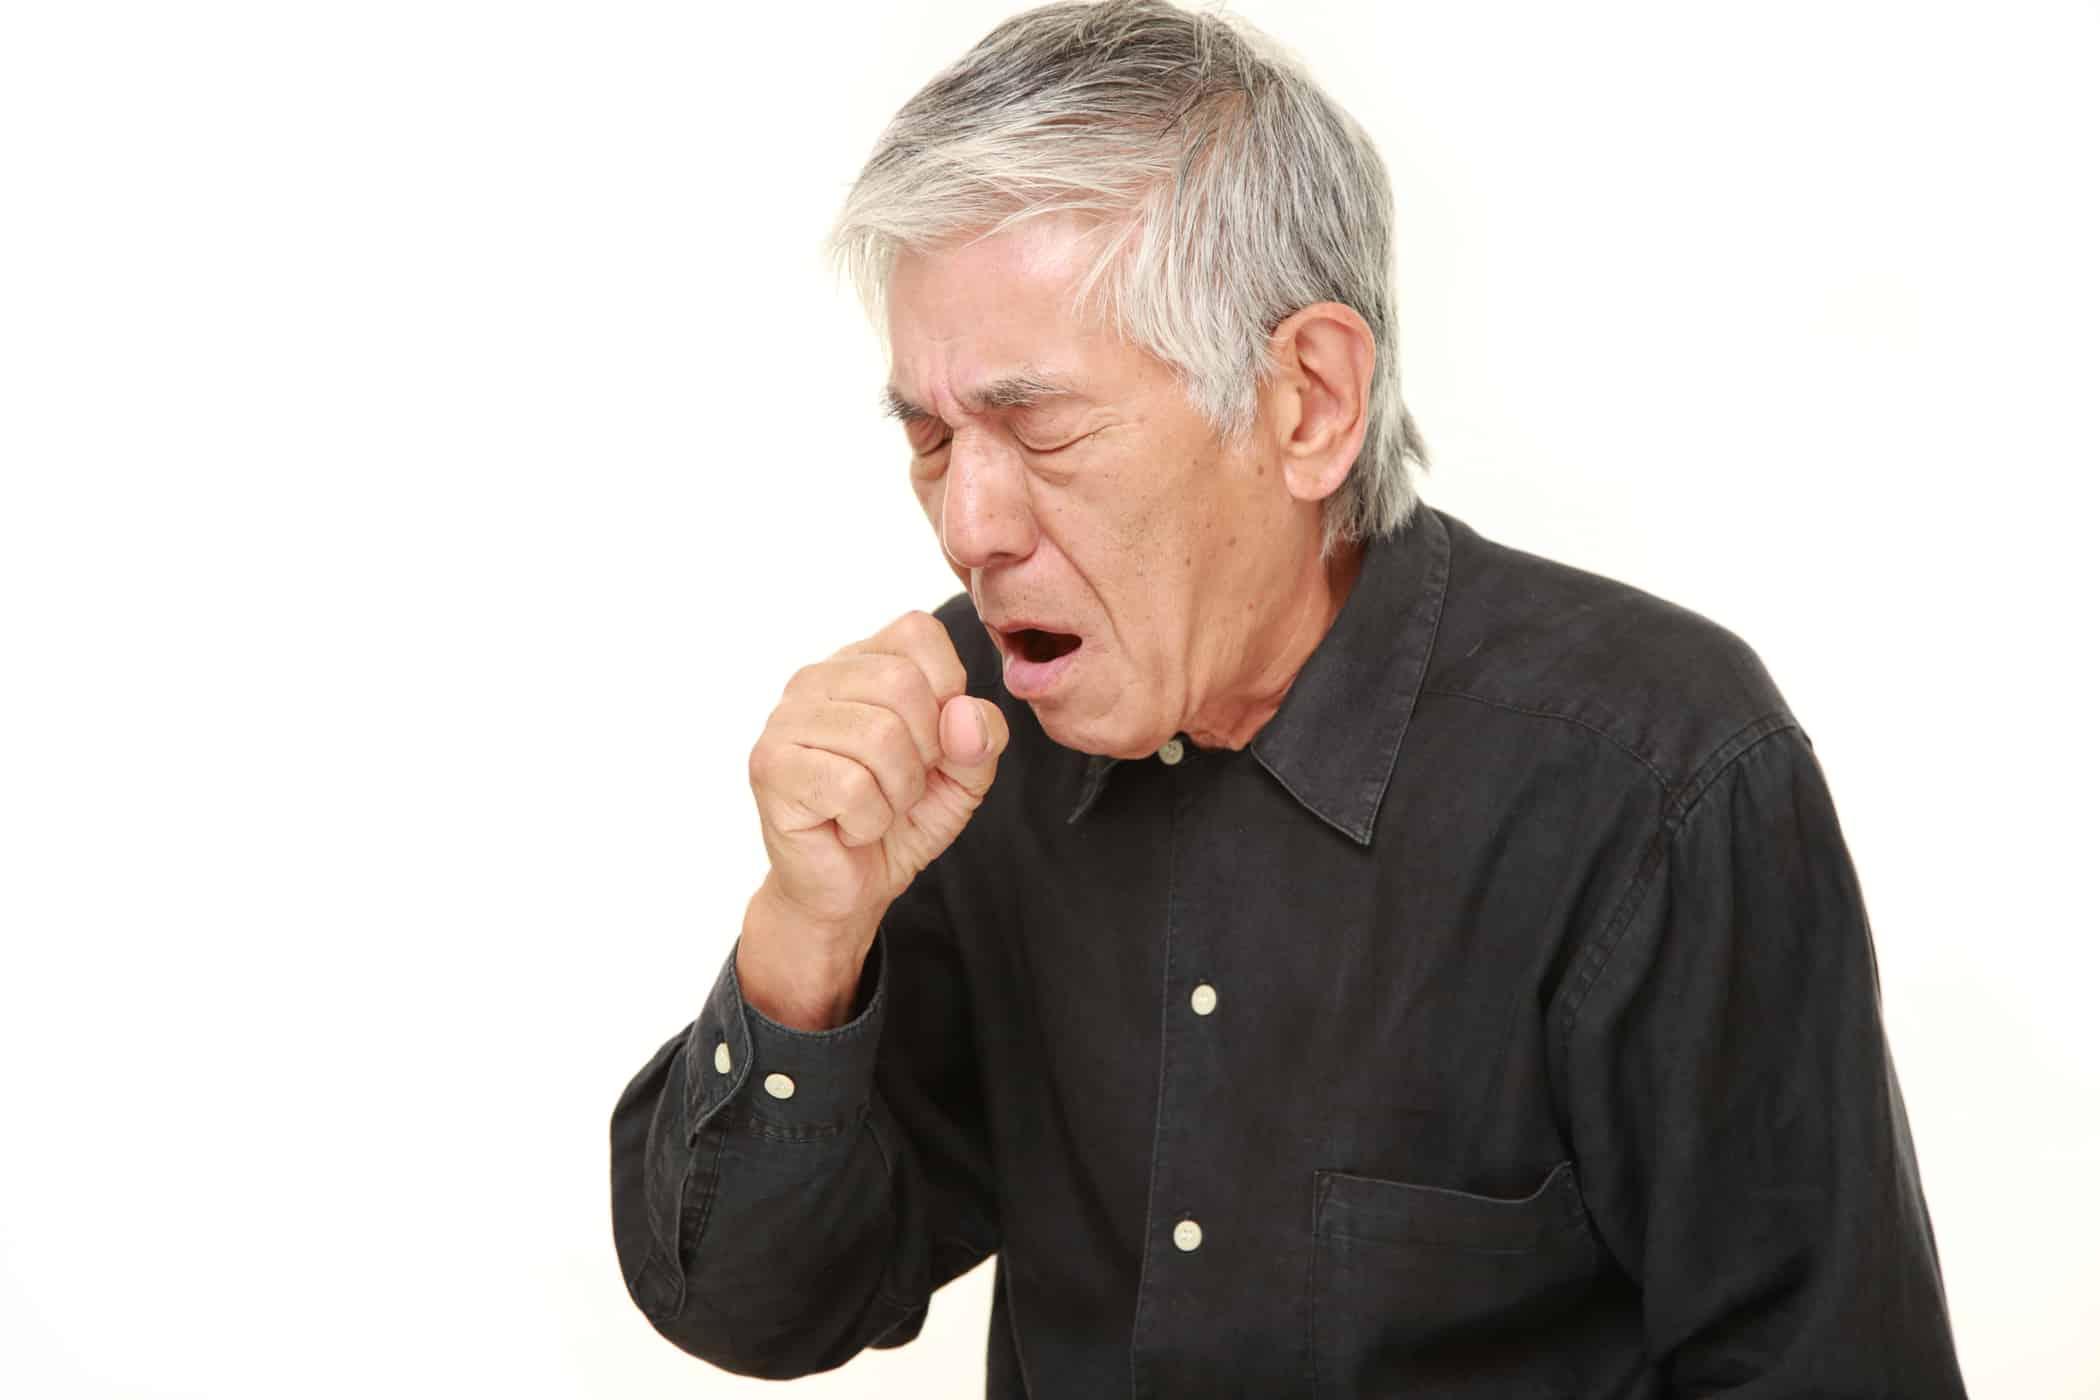 Penyakit TBC Di Indonesia Cukup Tinggi